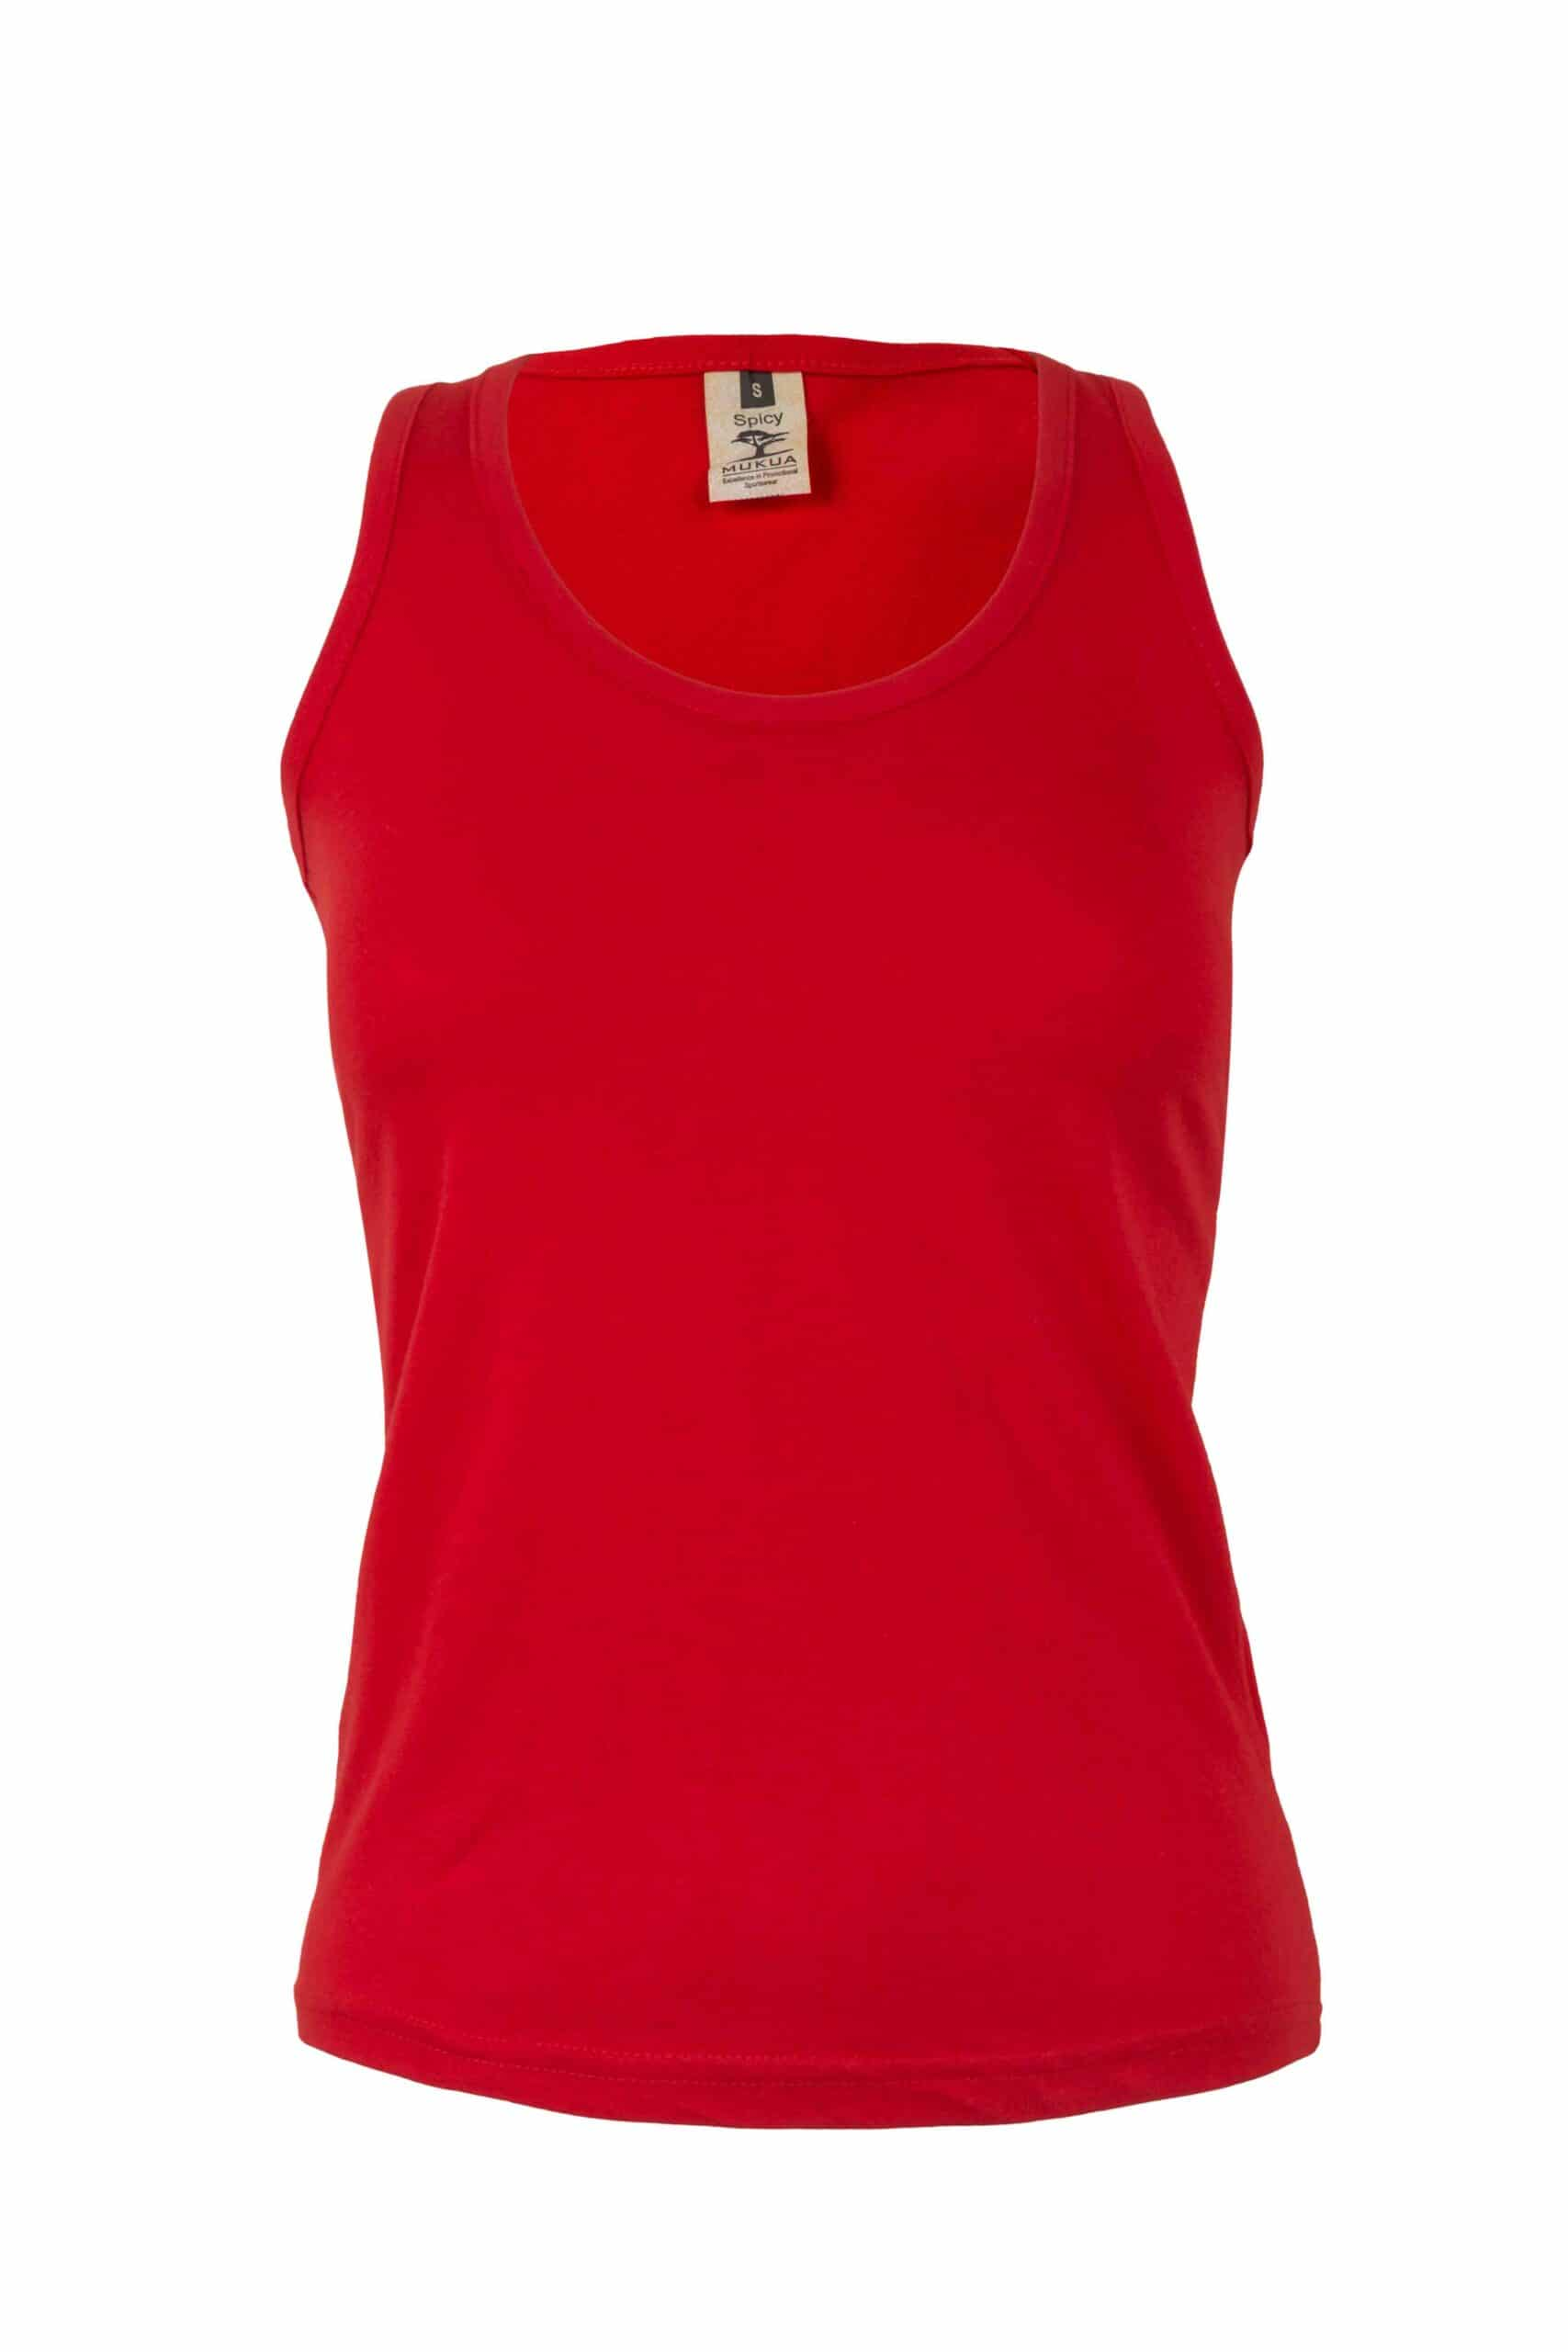 Mukua Mk171cv Camiseta Tirantes Mujer 150gr Red